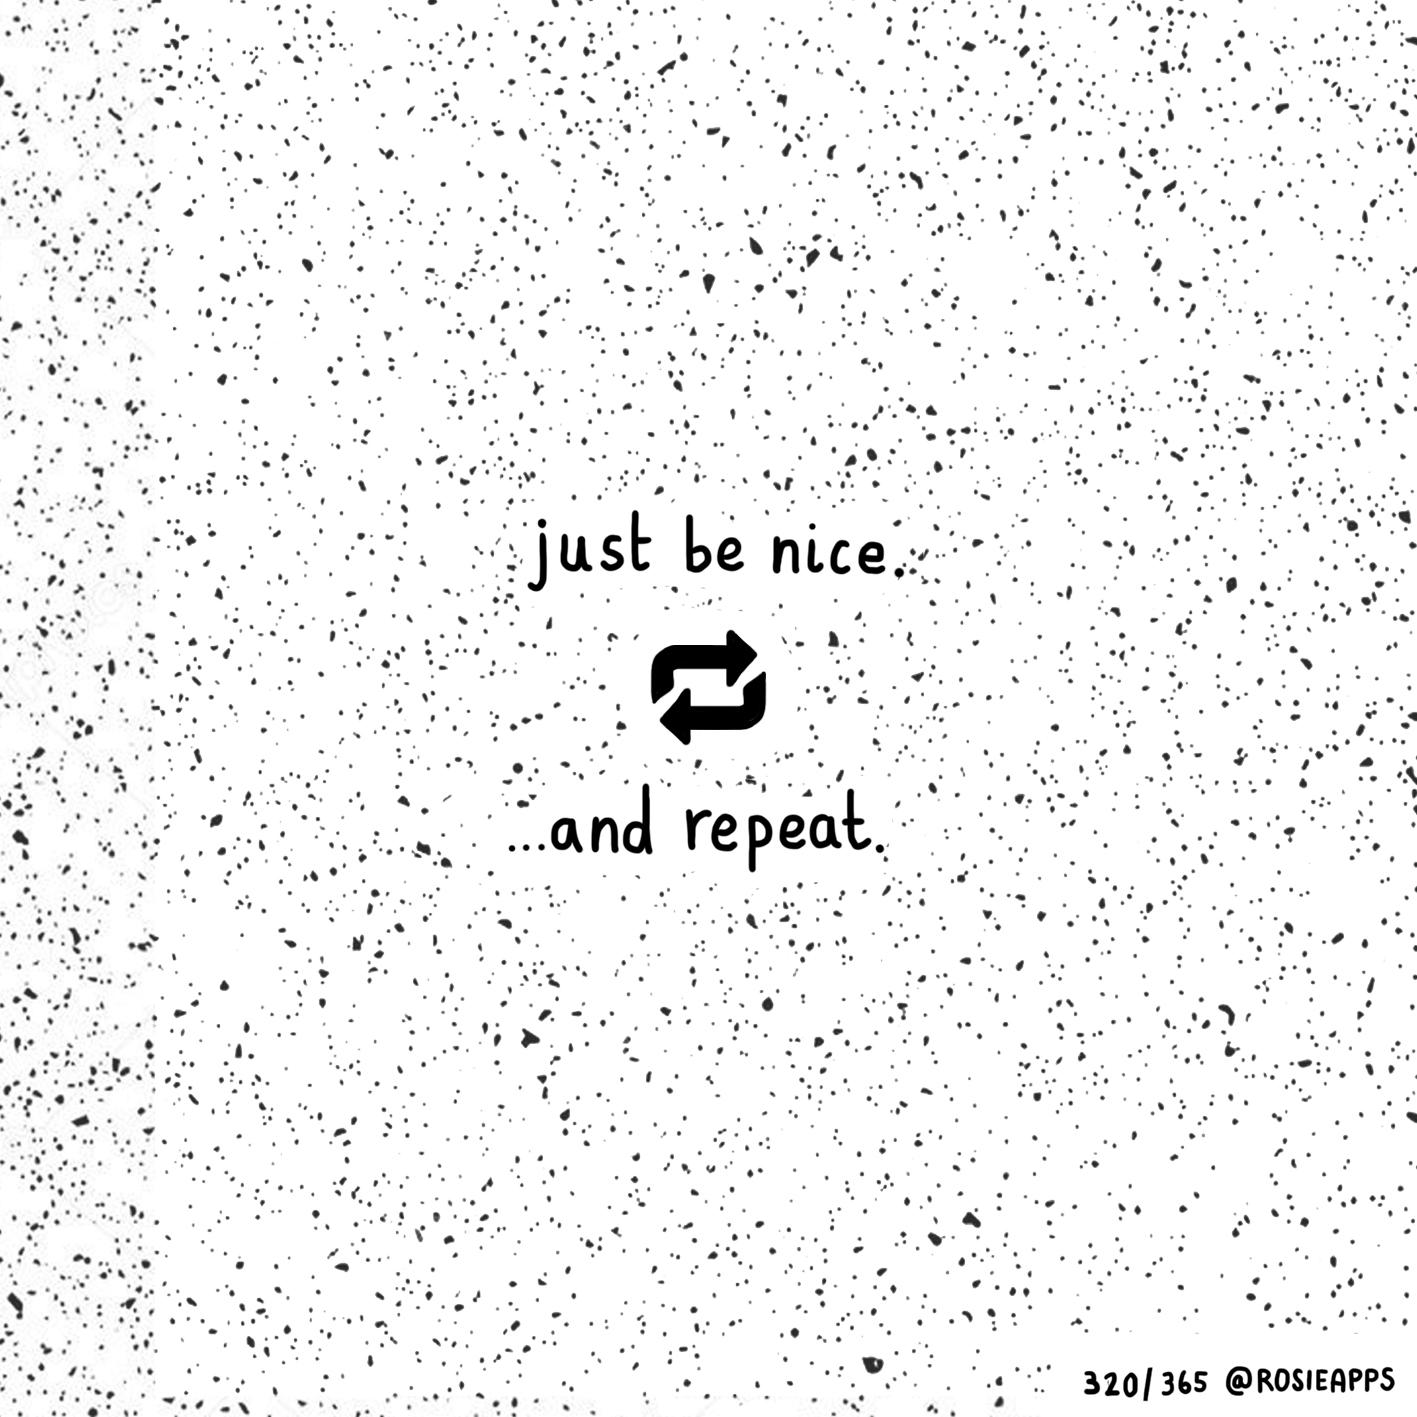 November-320-365 just be nice.jpg